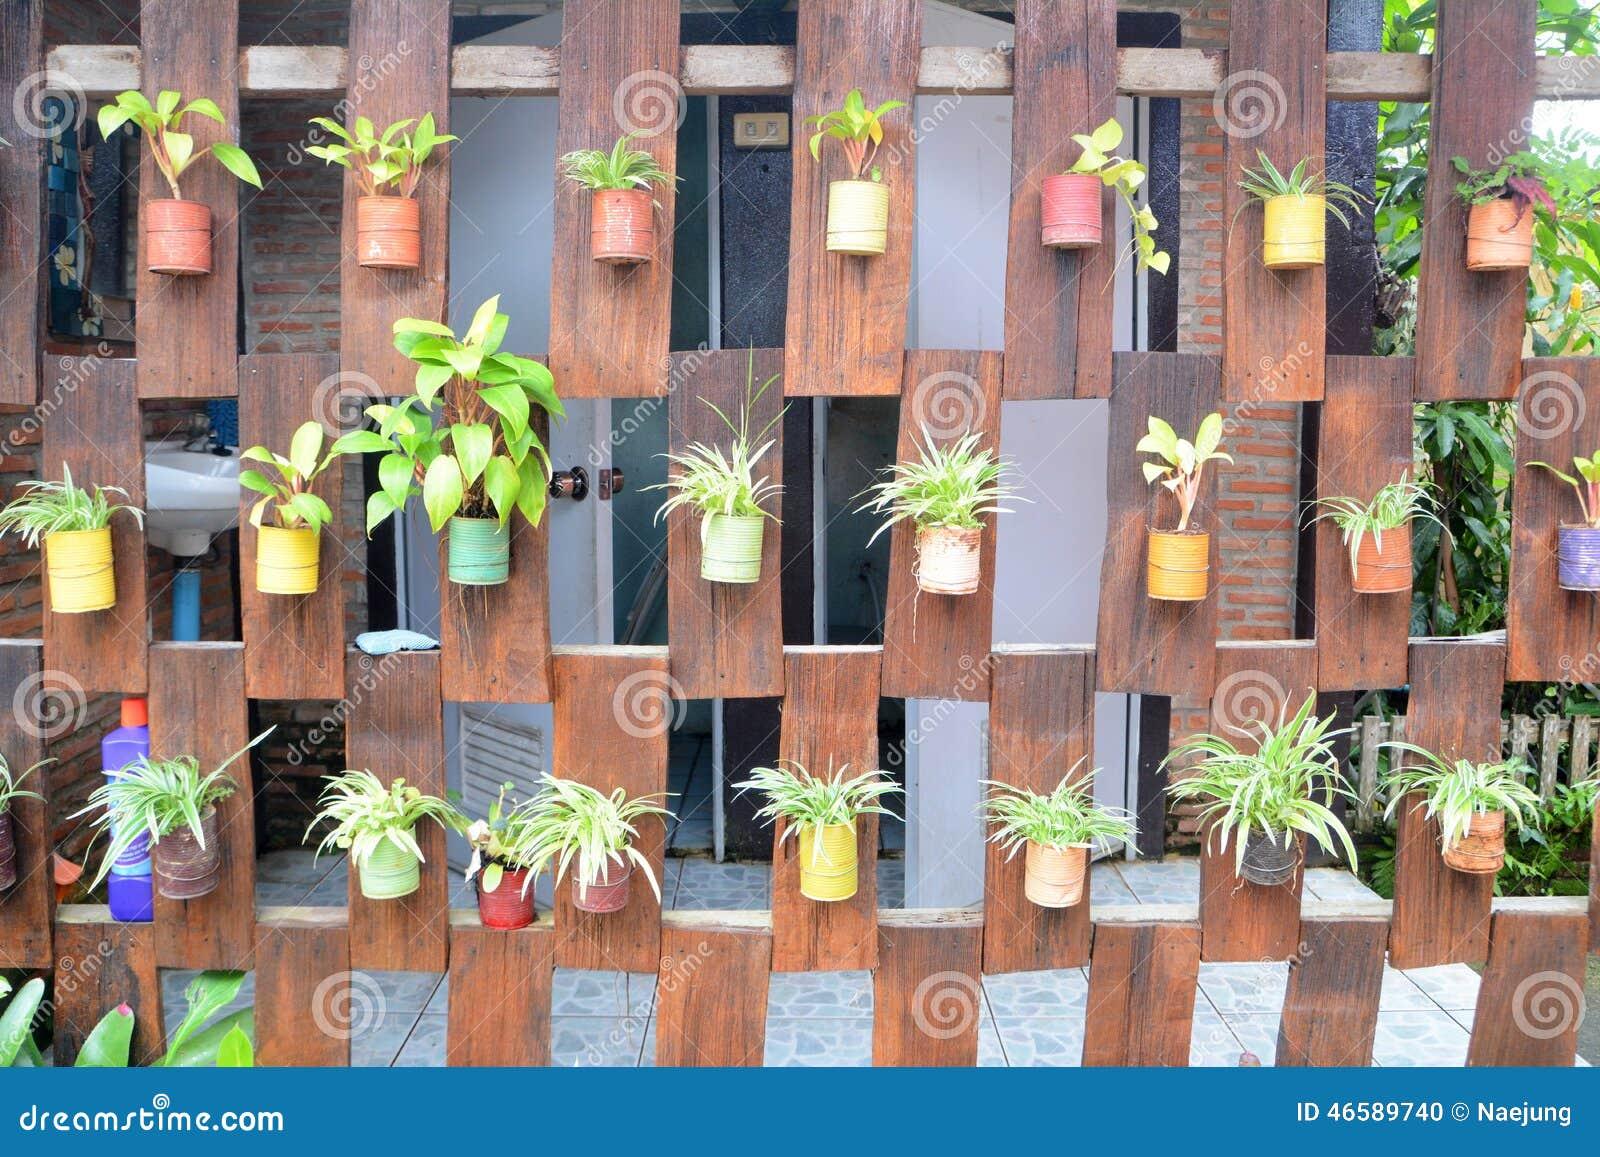 Hanging Plants Stock Photo Image 46589740